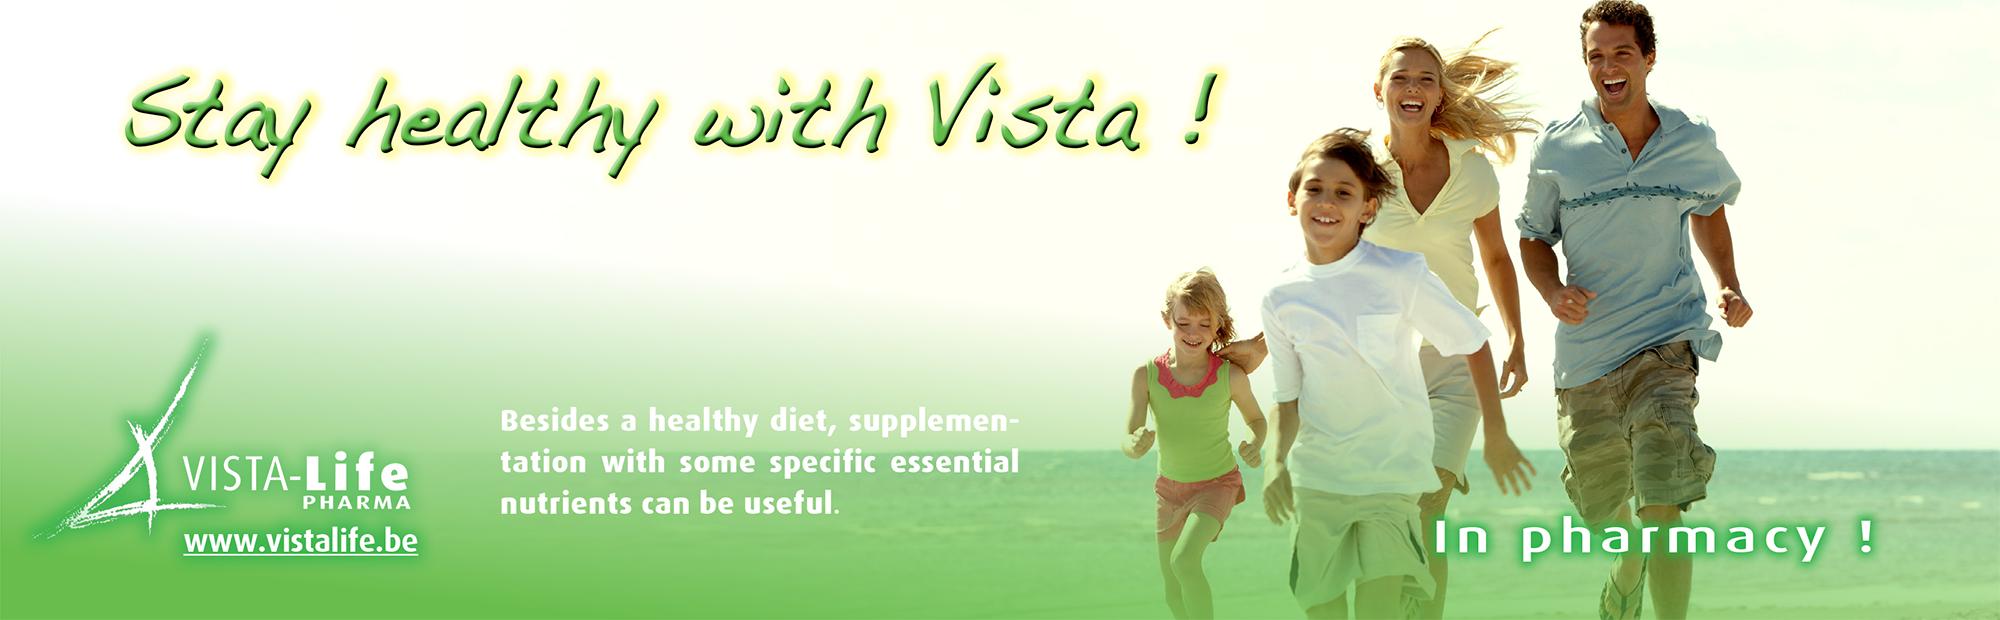 vista-life-pharma-(topbanner)3GB